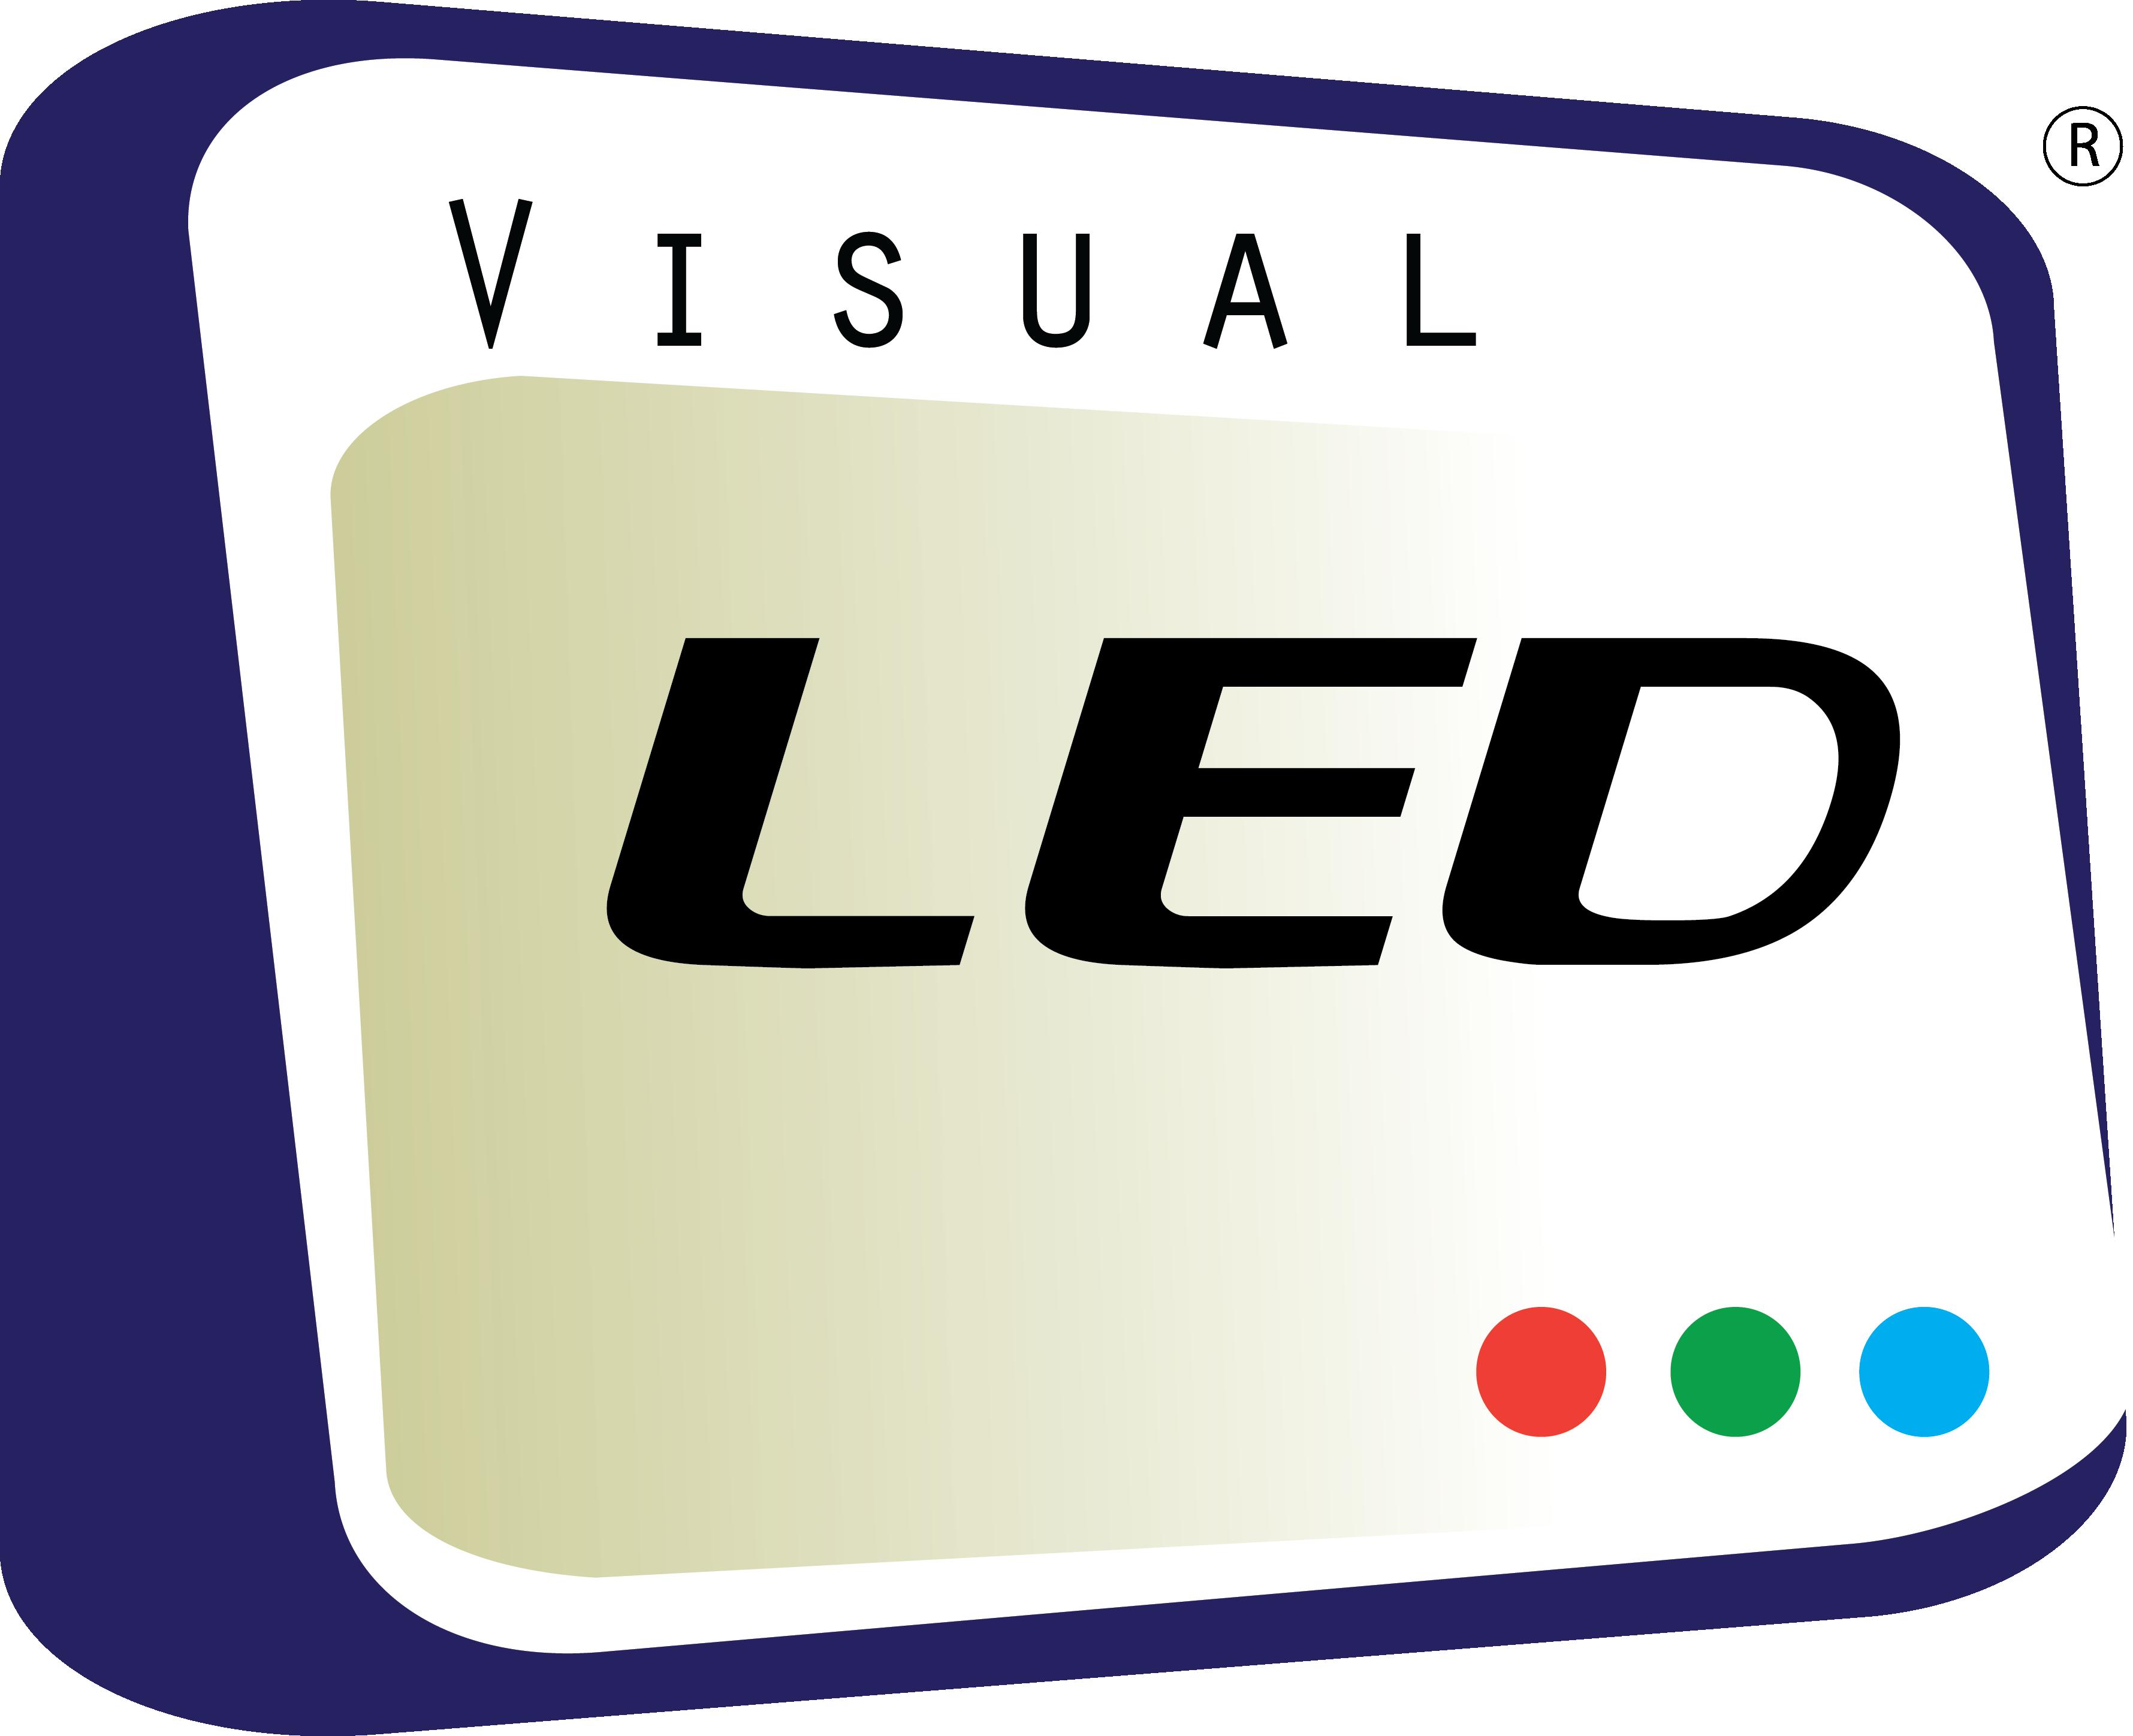 LOGO VISUAL LED